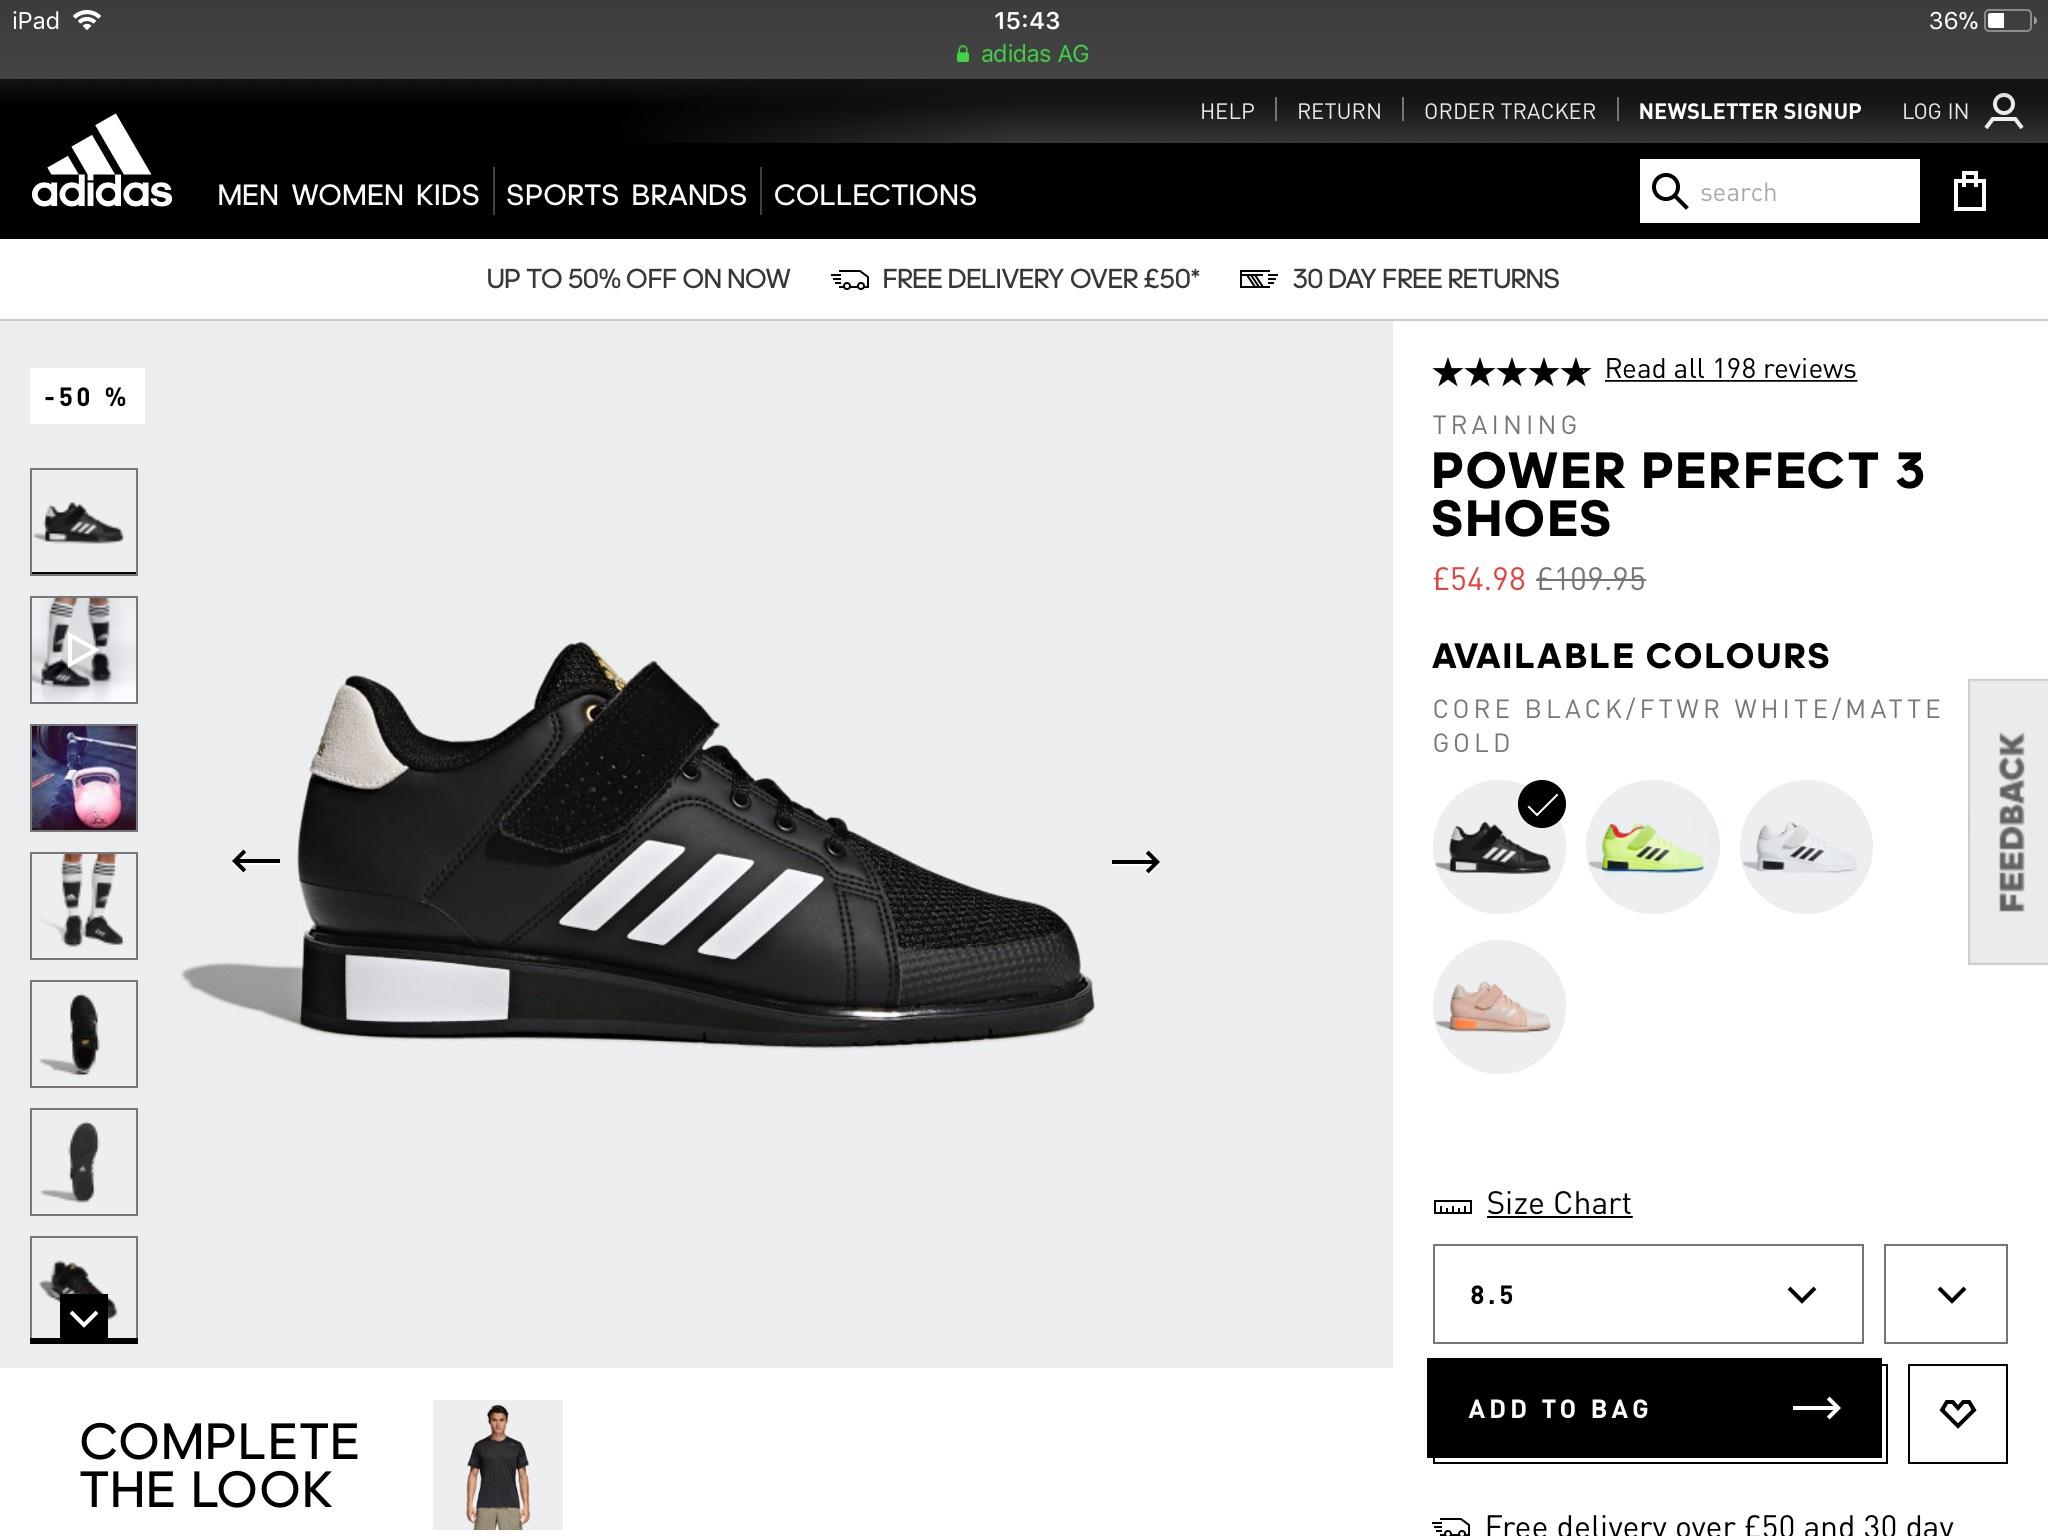 Adidas Weight Lifting Boots Power Perfect 3 - £54.98 @ Adidas Shop